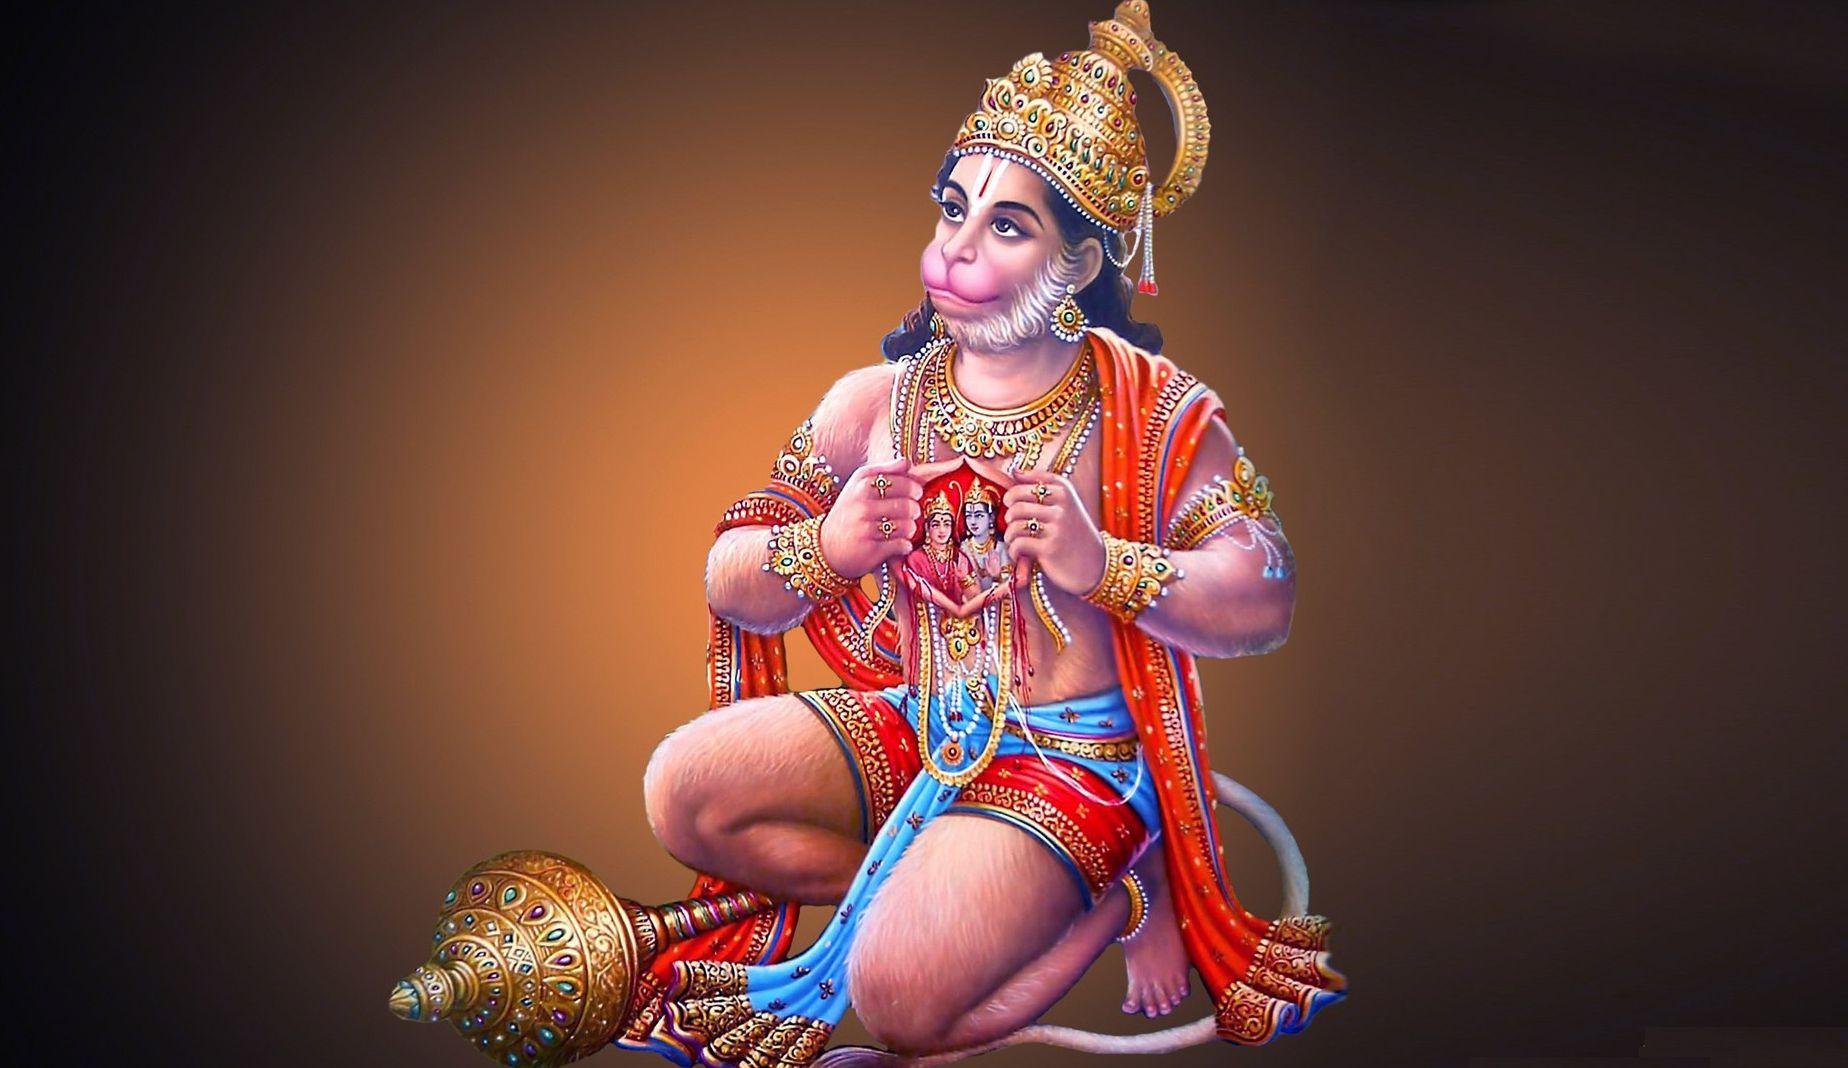 lord hanuman photos amp hd hanuman images free download